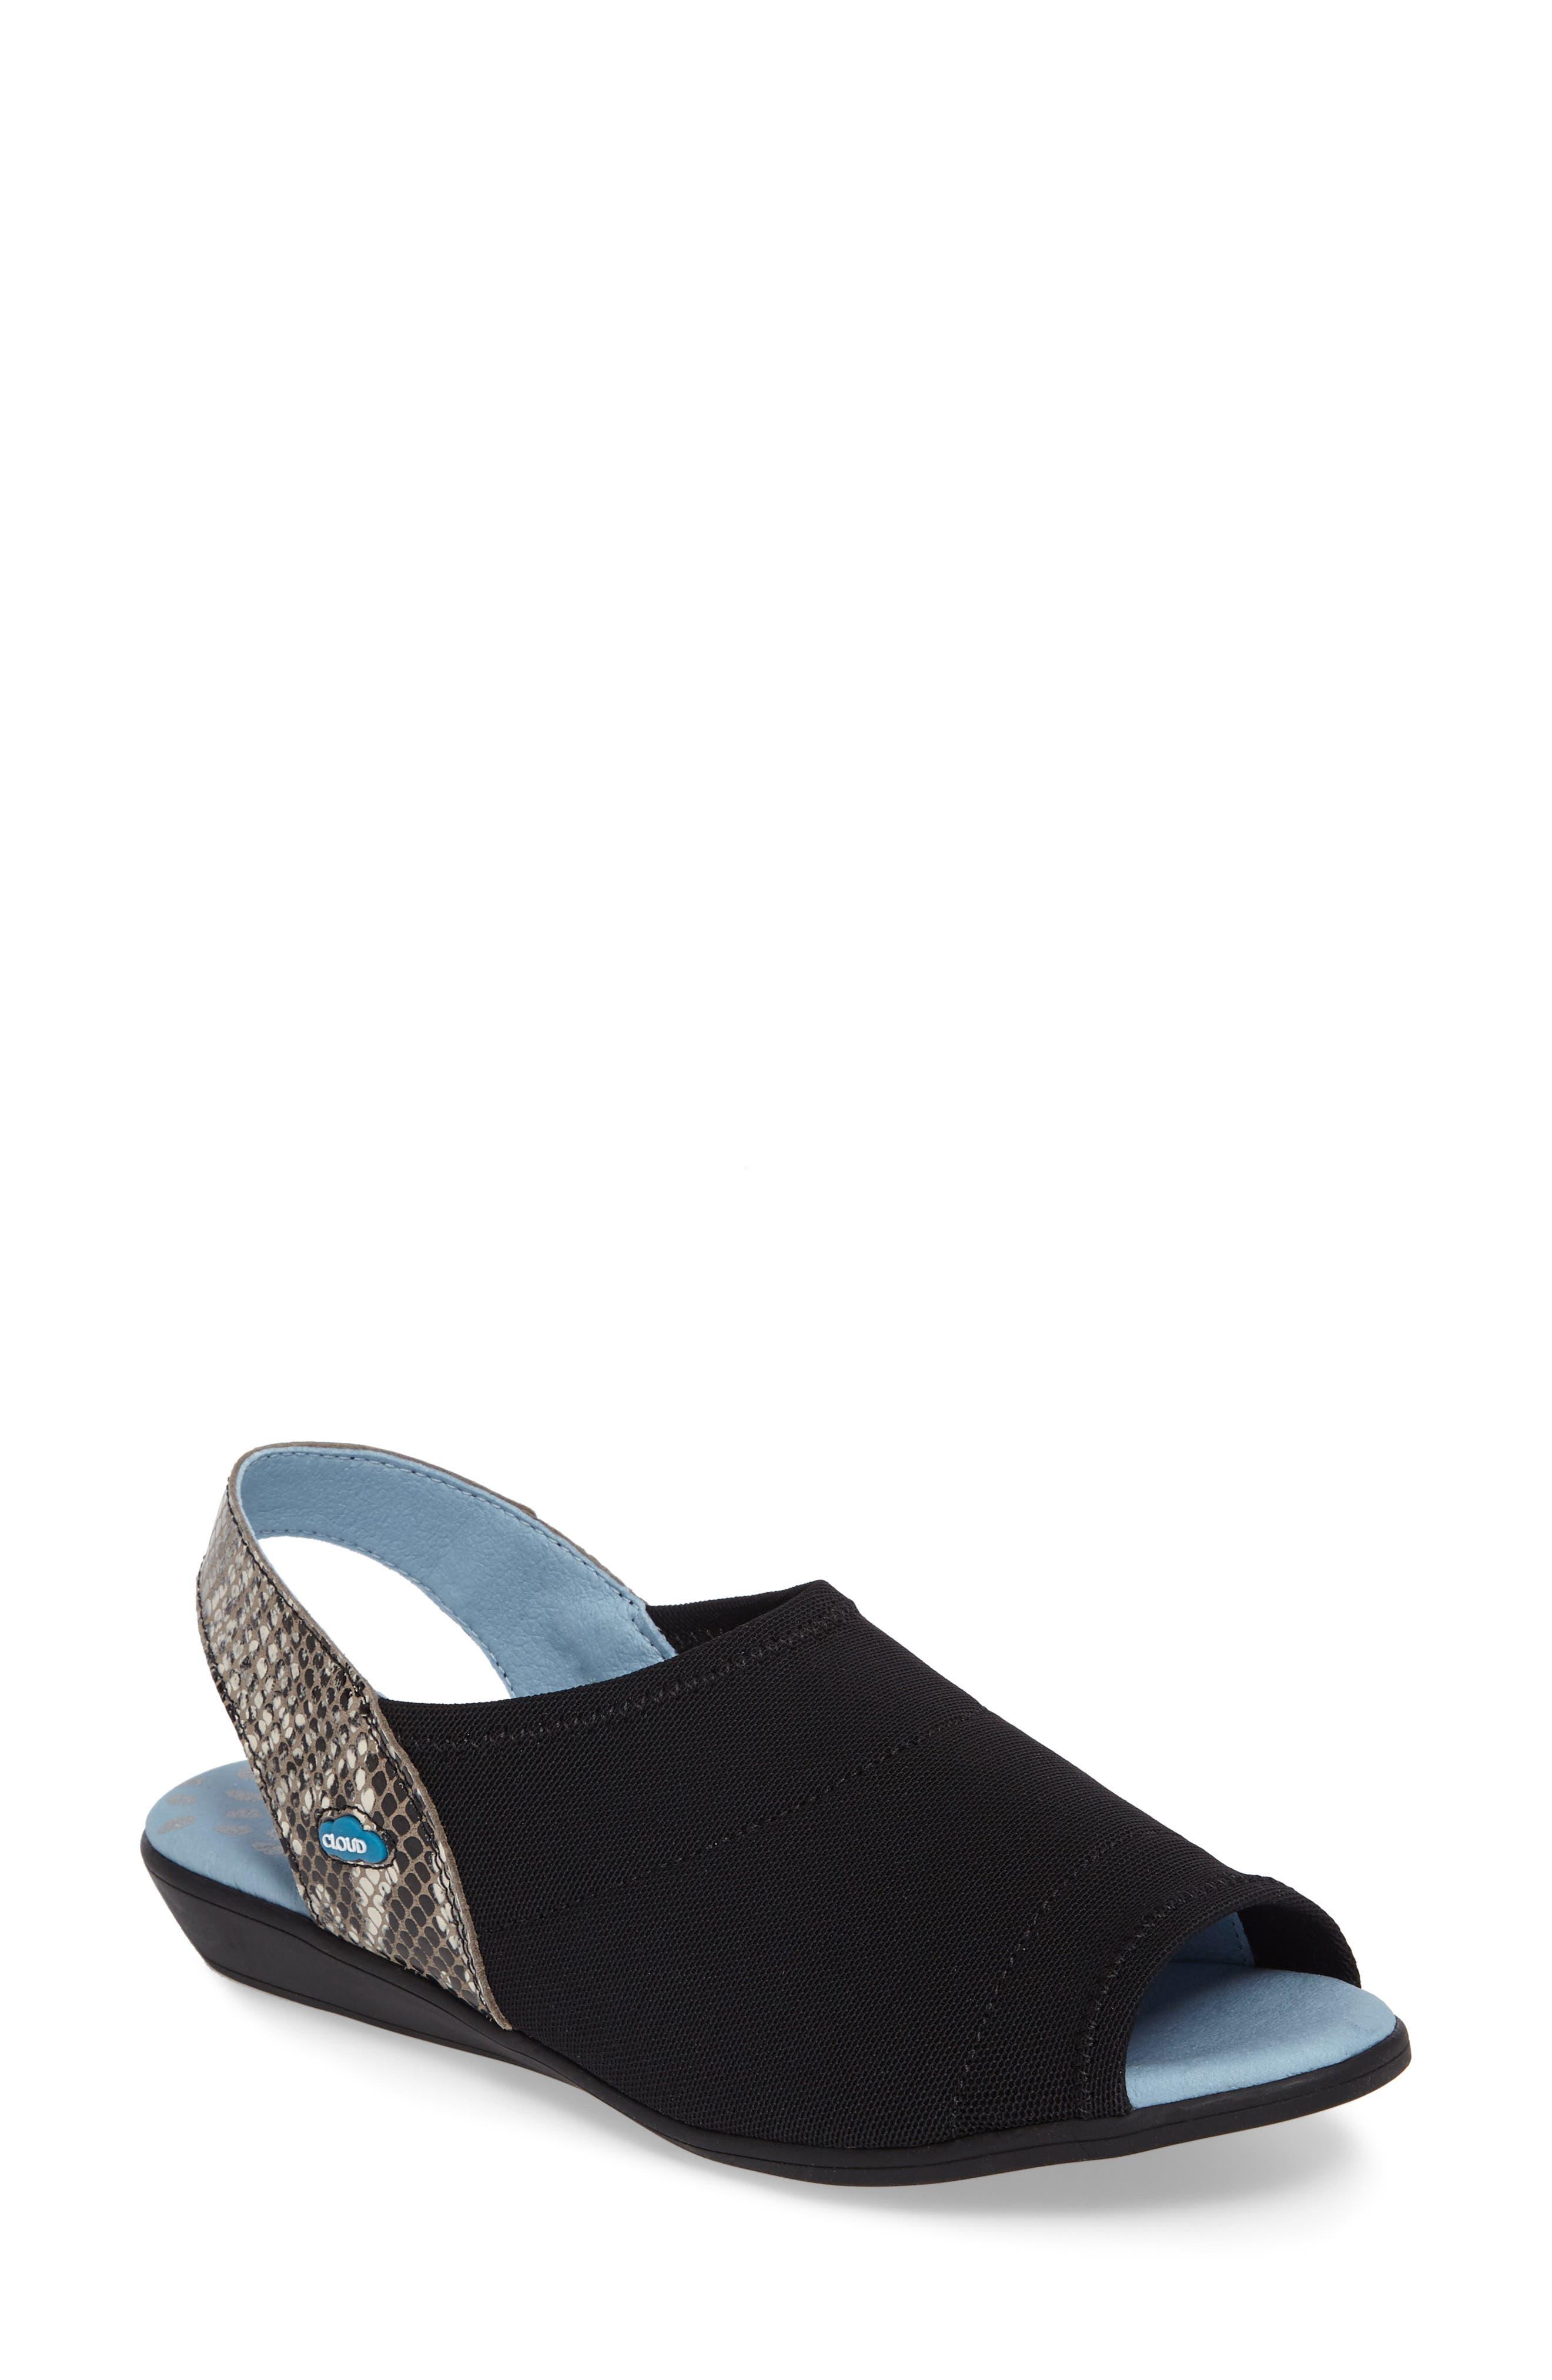 CLOUD Cuteness Slingback Sandal (Women)